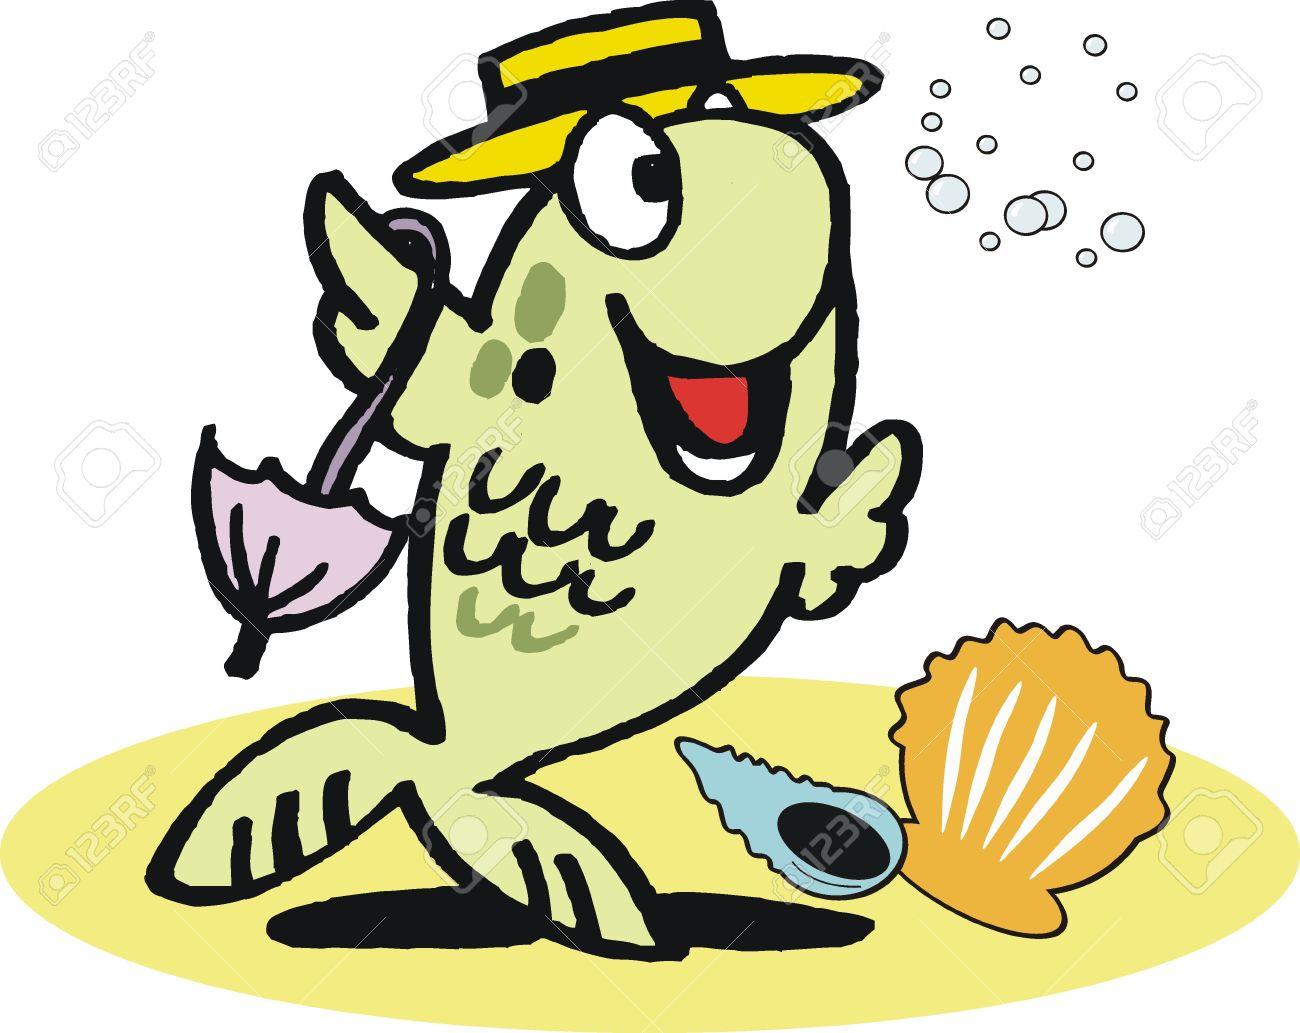 funny dancing fish cartoon royalty free cliparts vectors and stock rh 123rf com Under the Sea Clip Art Funny Fishing Clip Art